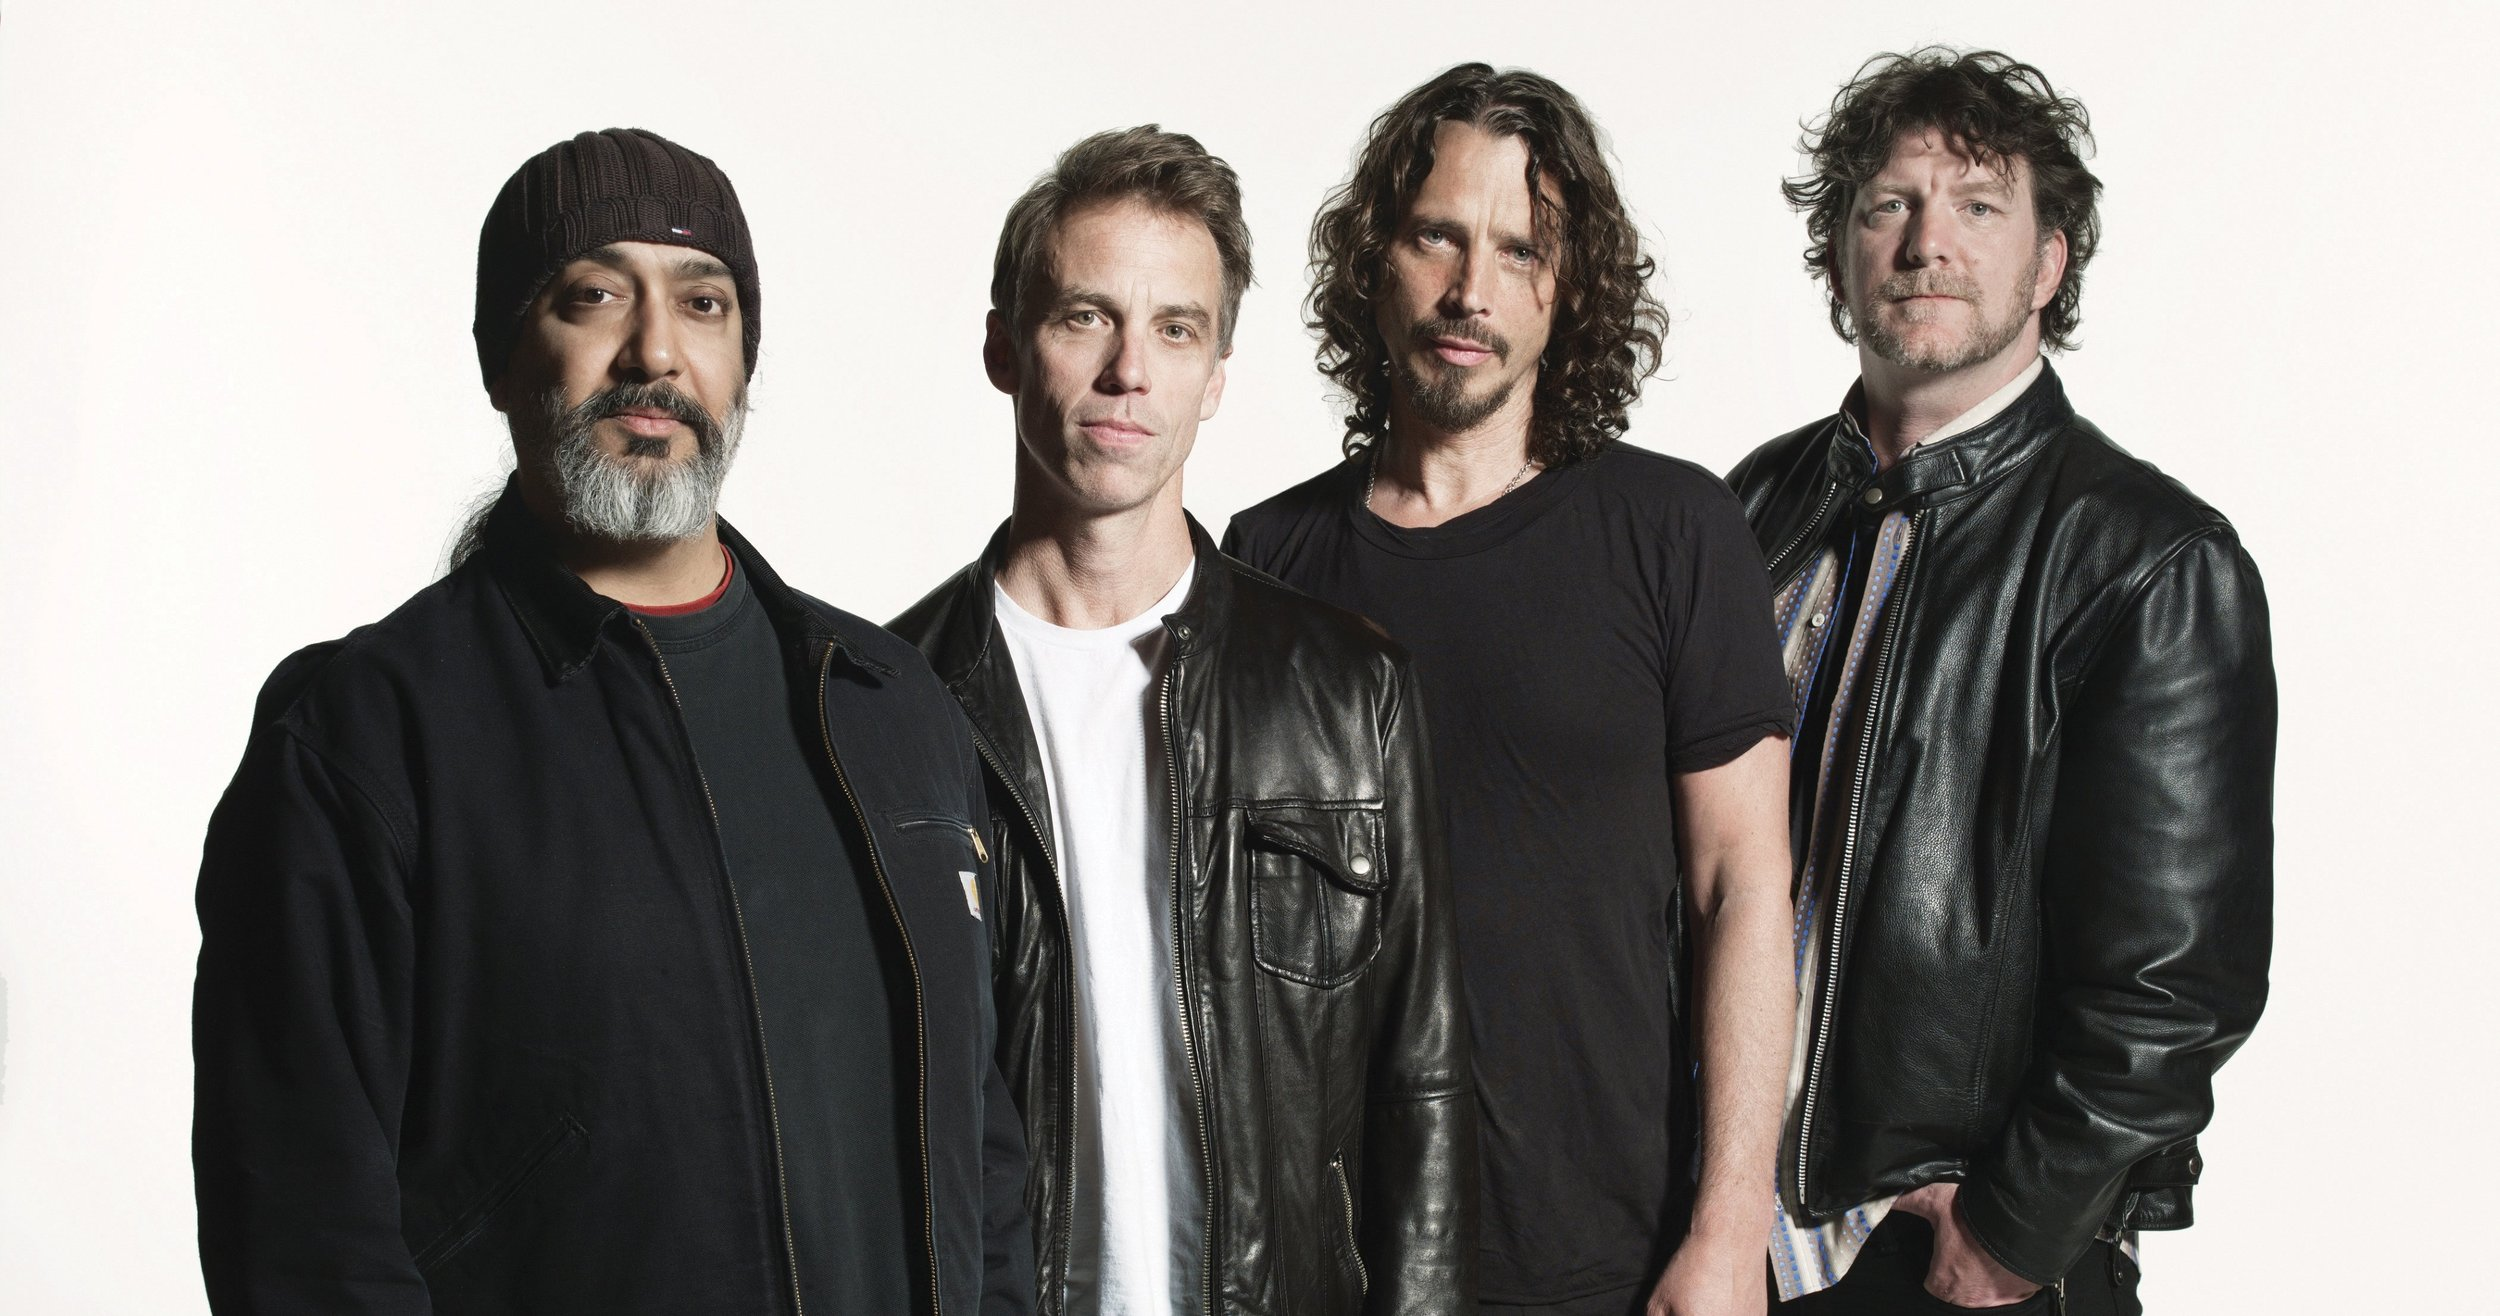 Copy of Soundgarden